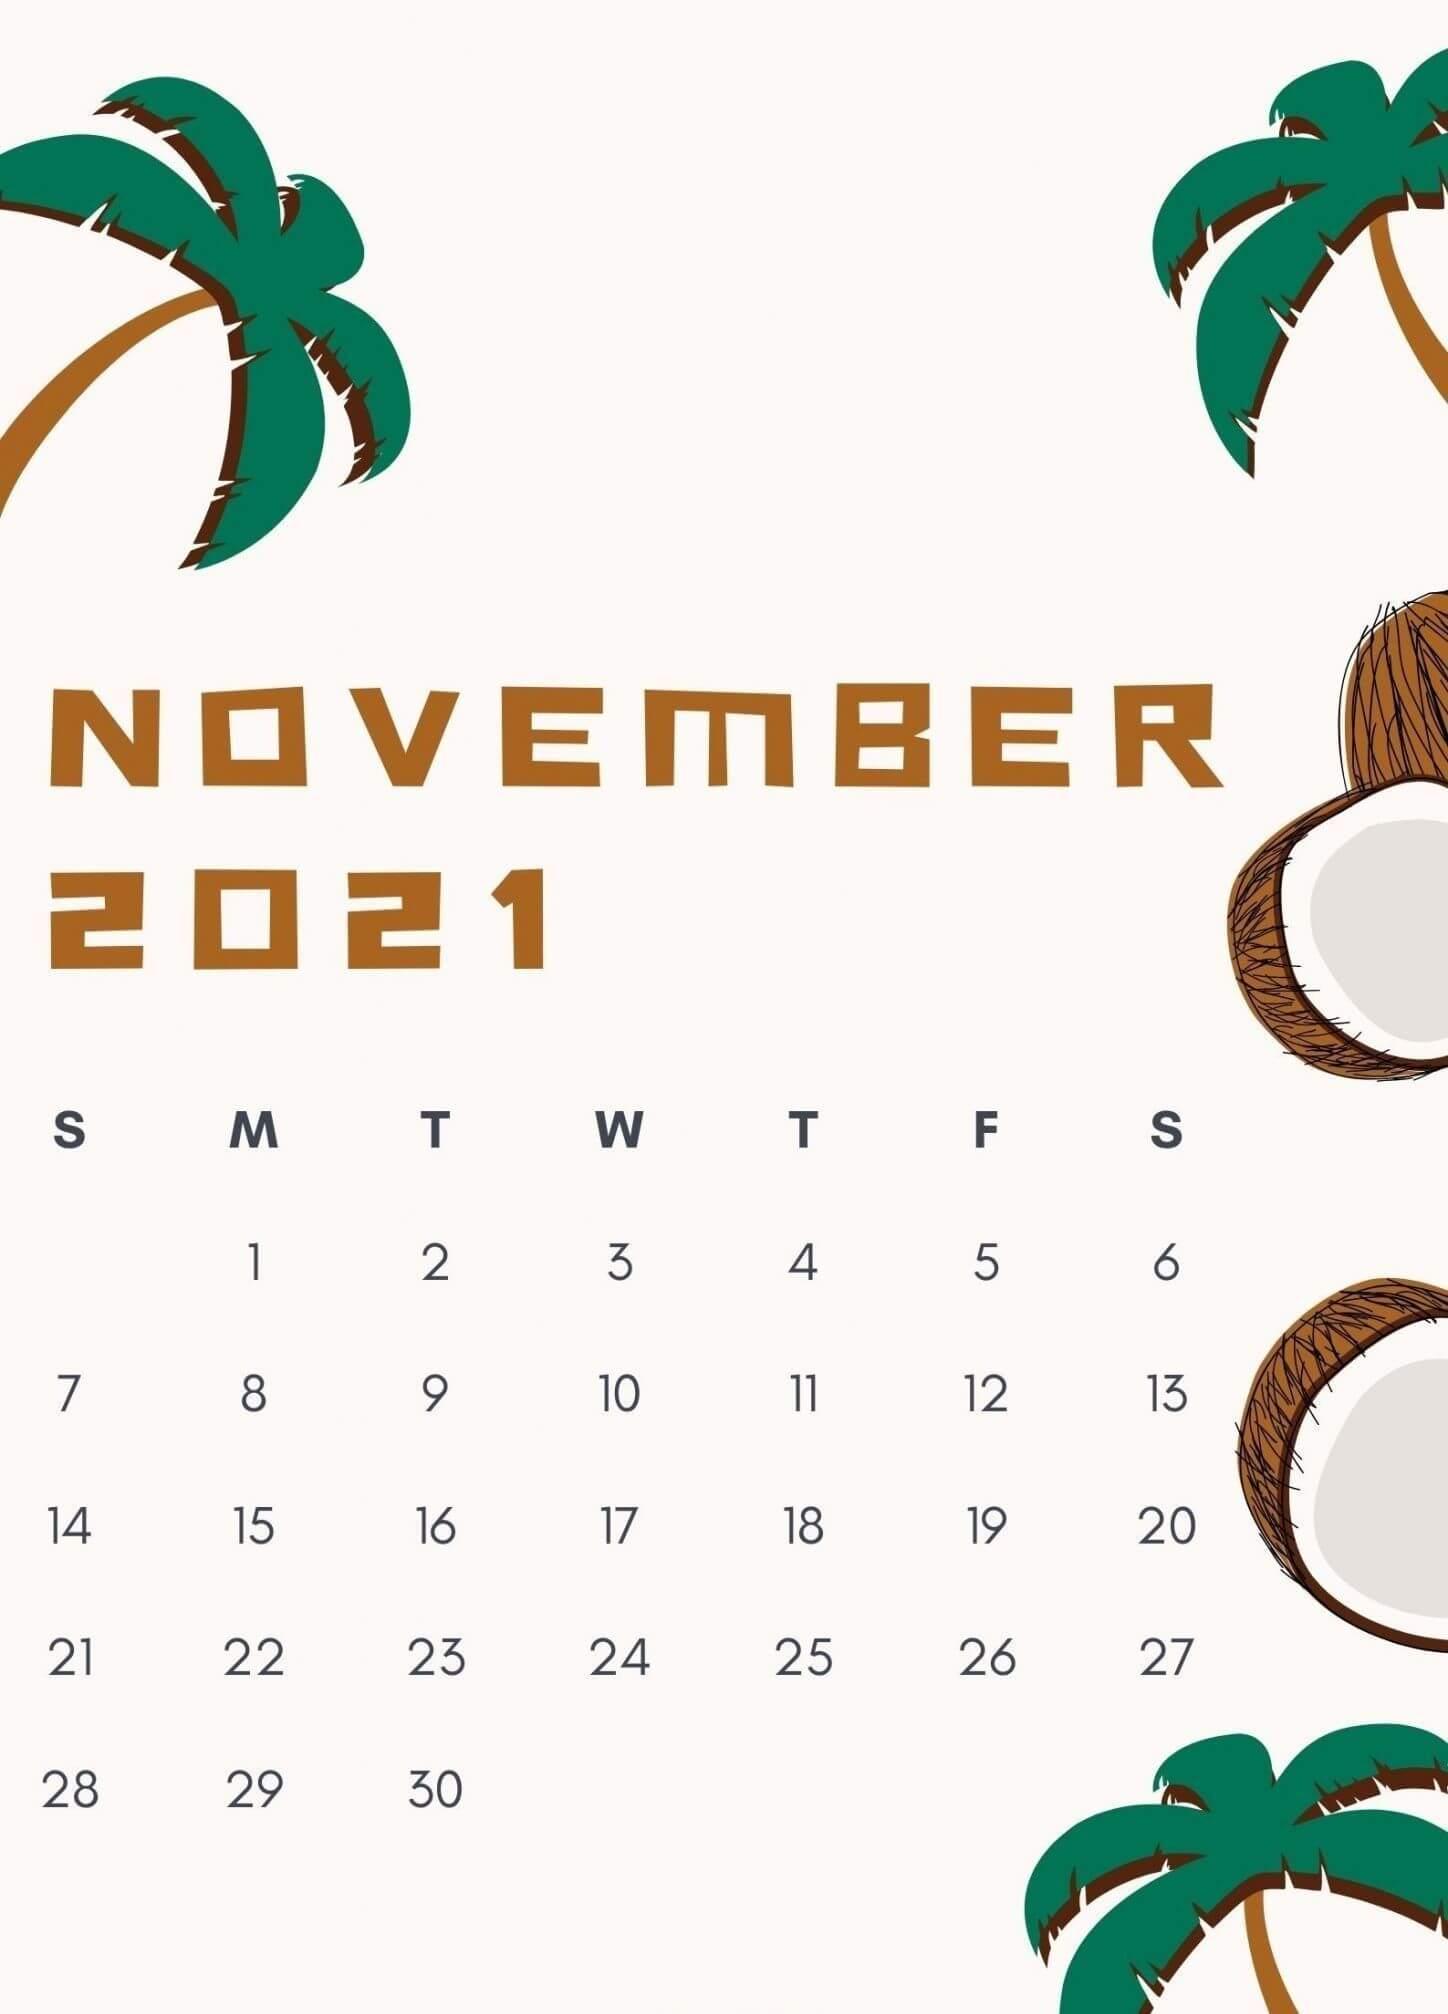 November 2021 iphone Calendar Wallpaper